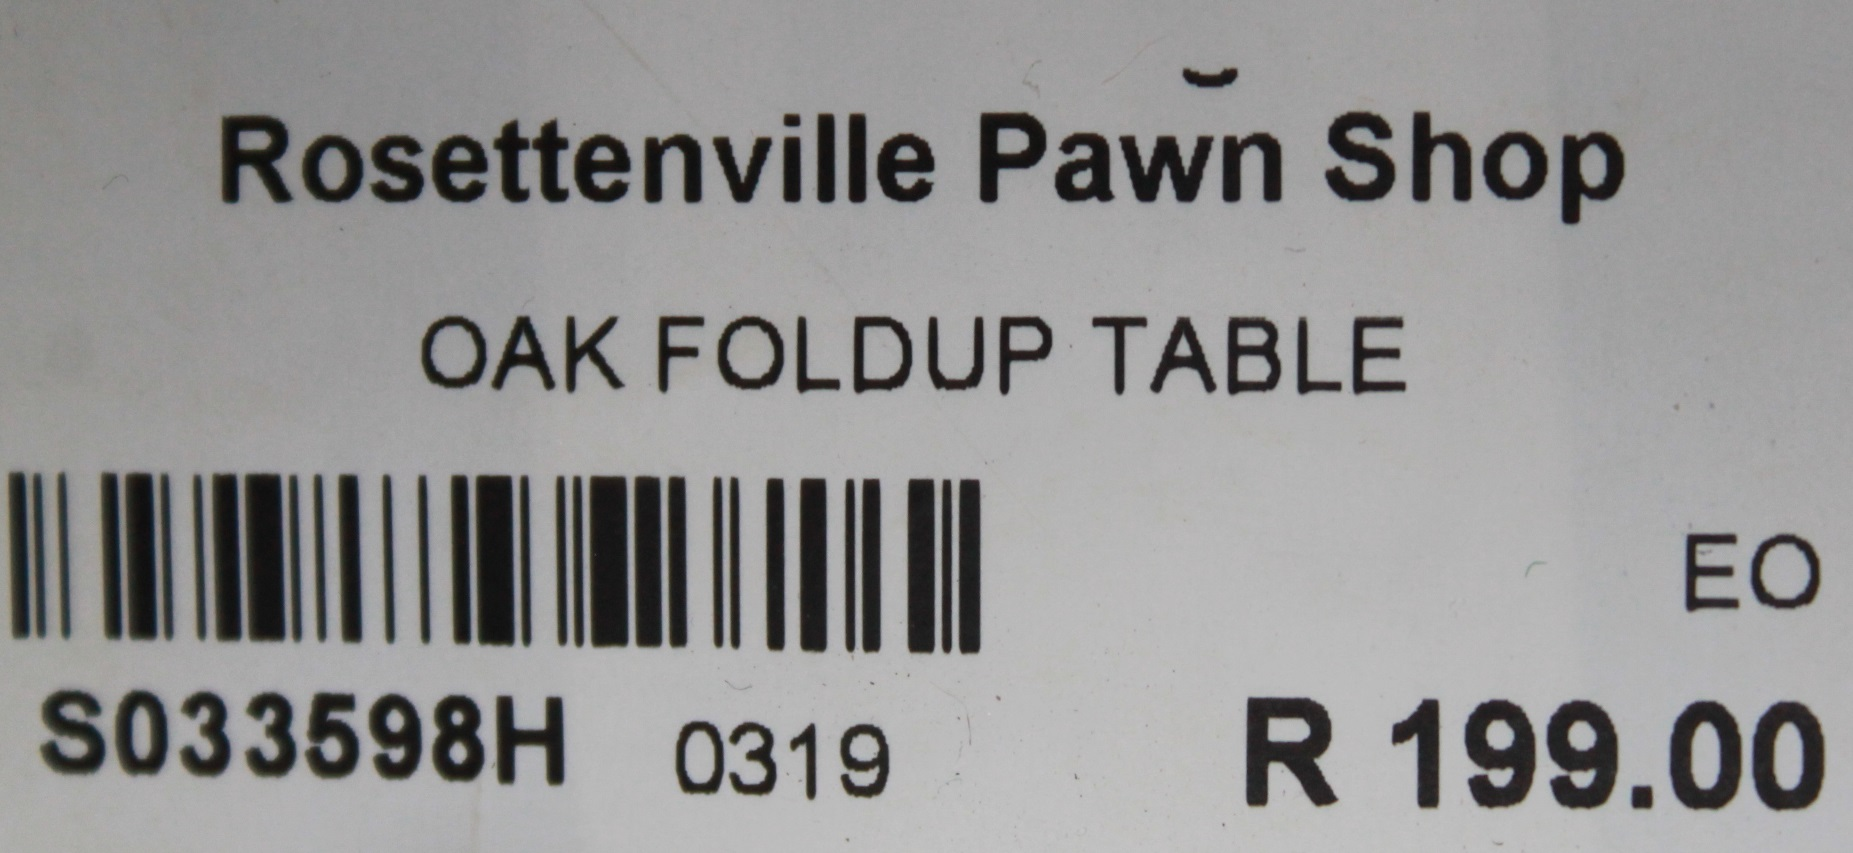 S033598H Oak foldup table #Rosettenvillepawnshop